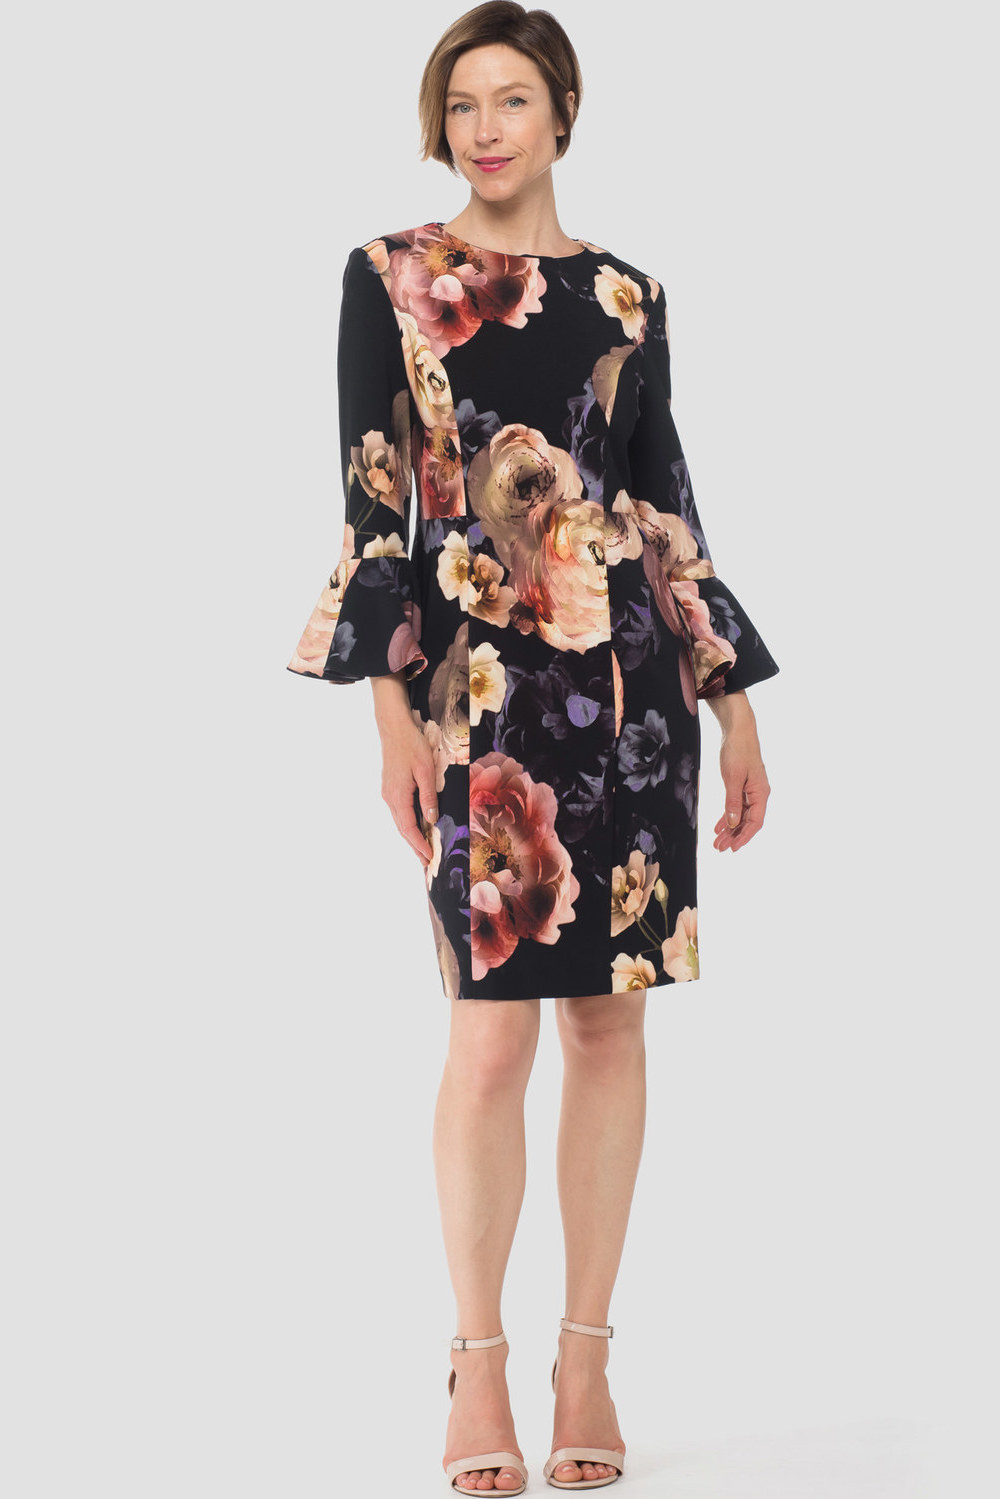 Joseph Ribkoff Black/Multi Dresses Style 183648